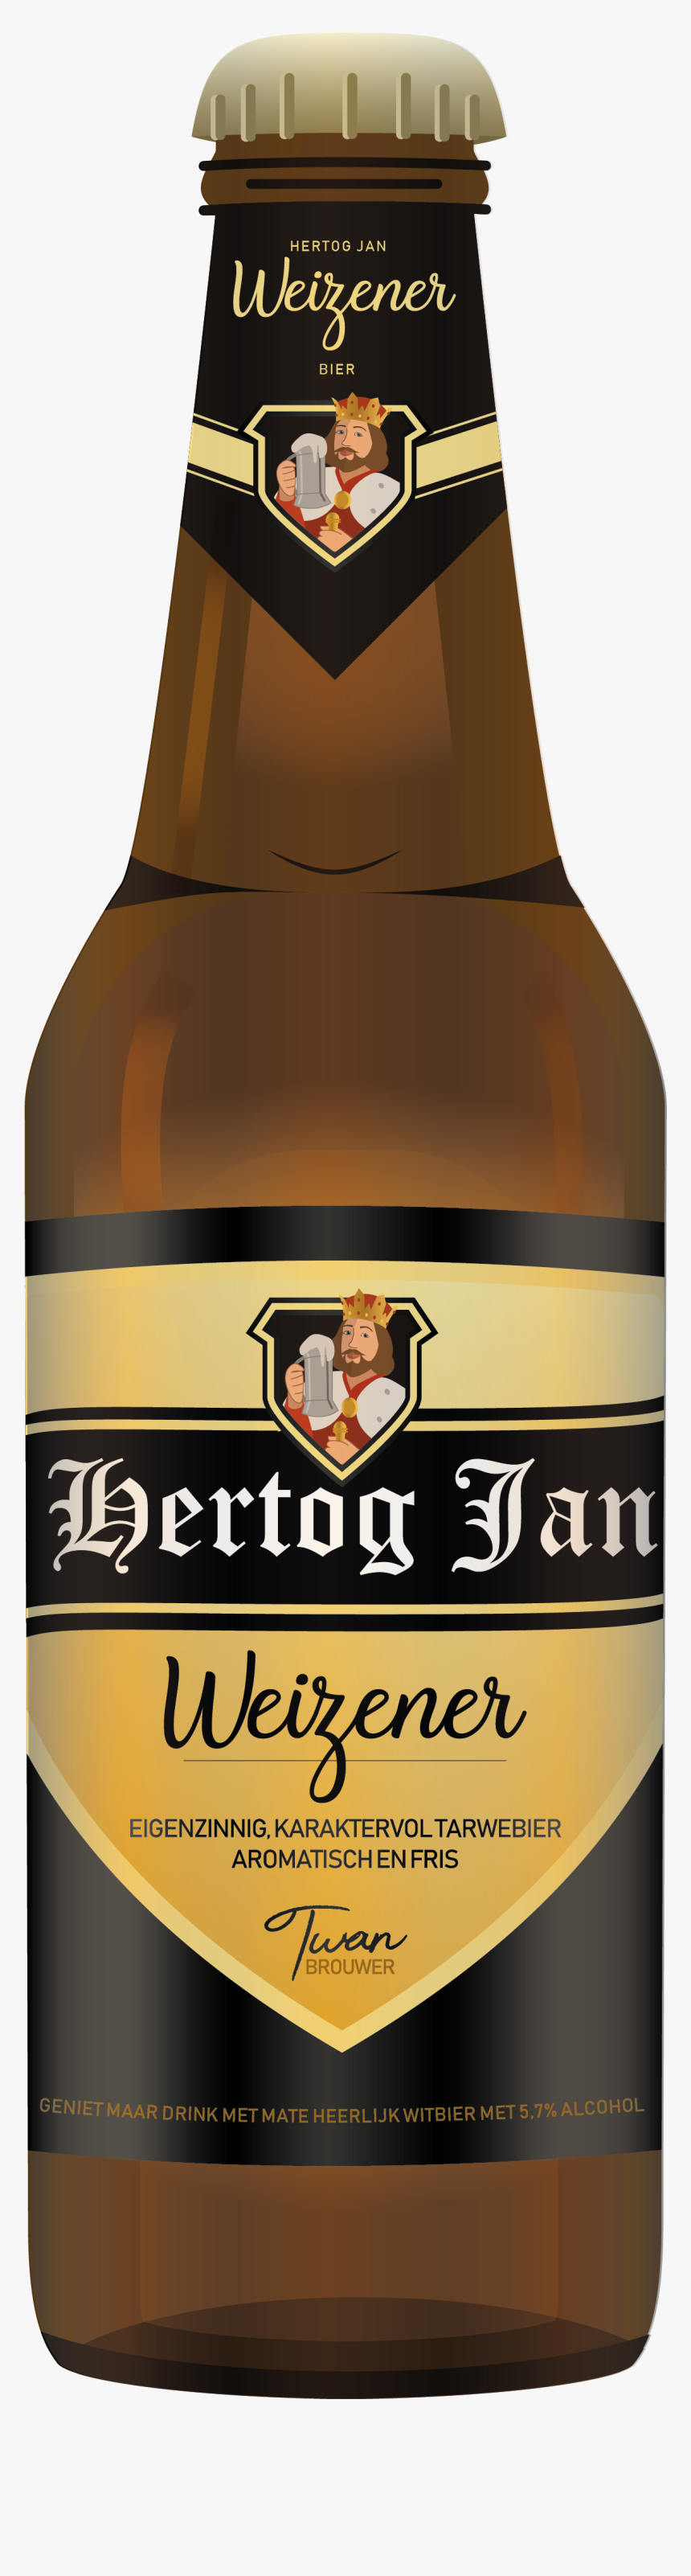 Hertog Jan, HD Png Download, Free Download